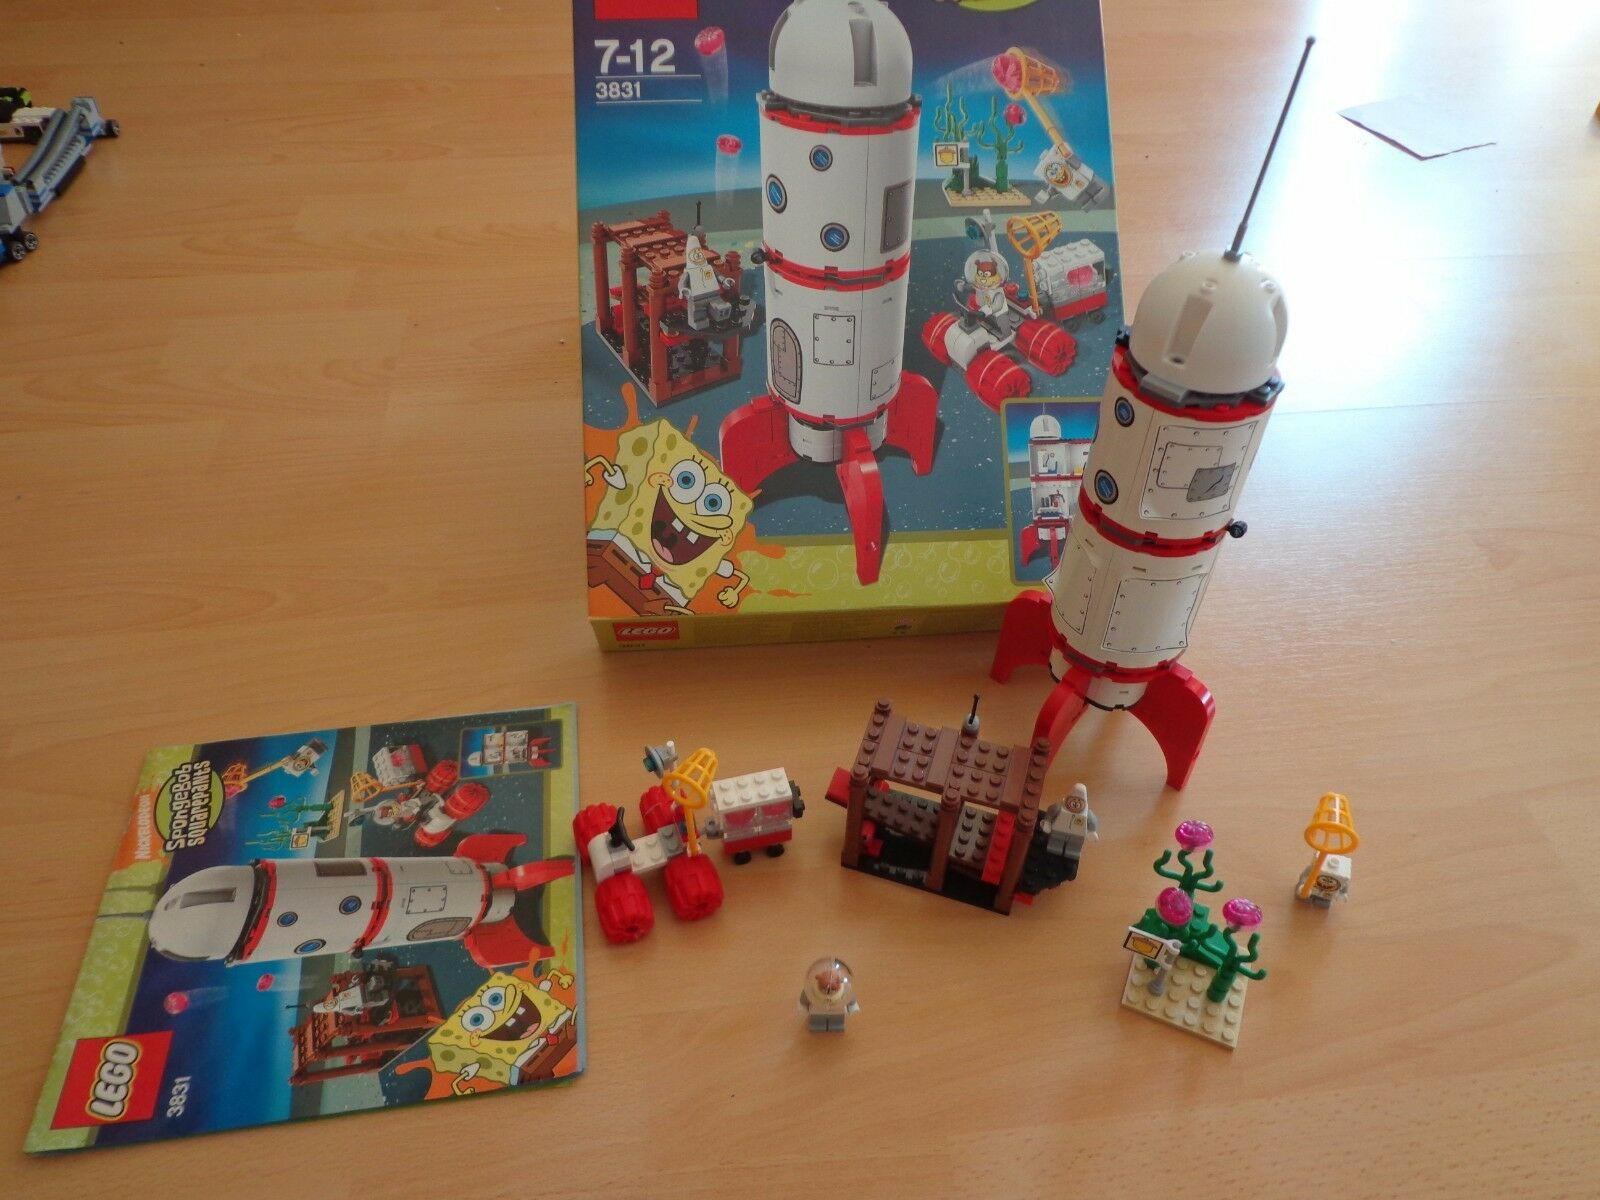 Lego 3831 SpongeBob Raketenfahrt  OVP mit Bauanleitung komplett